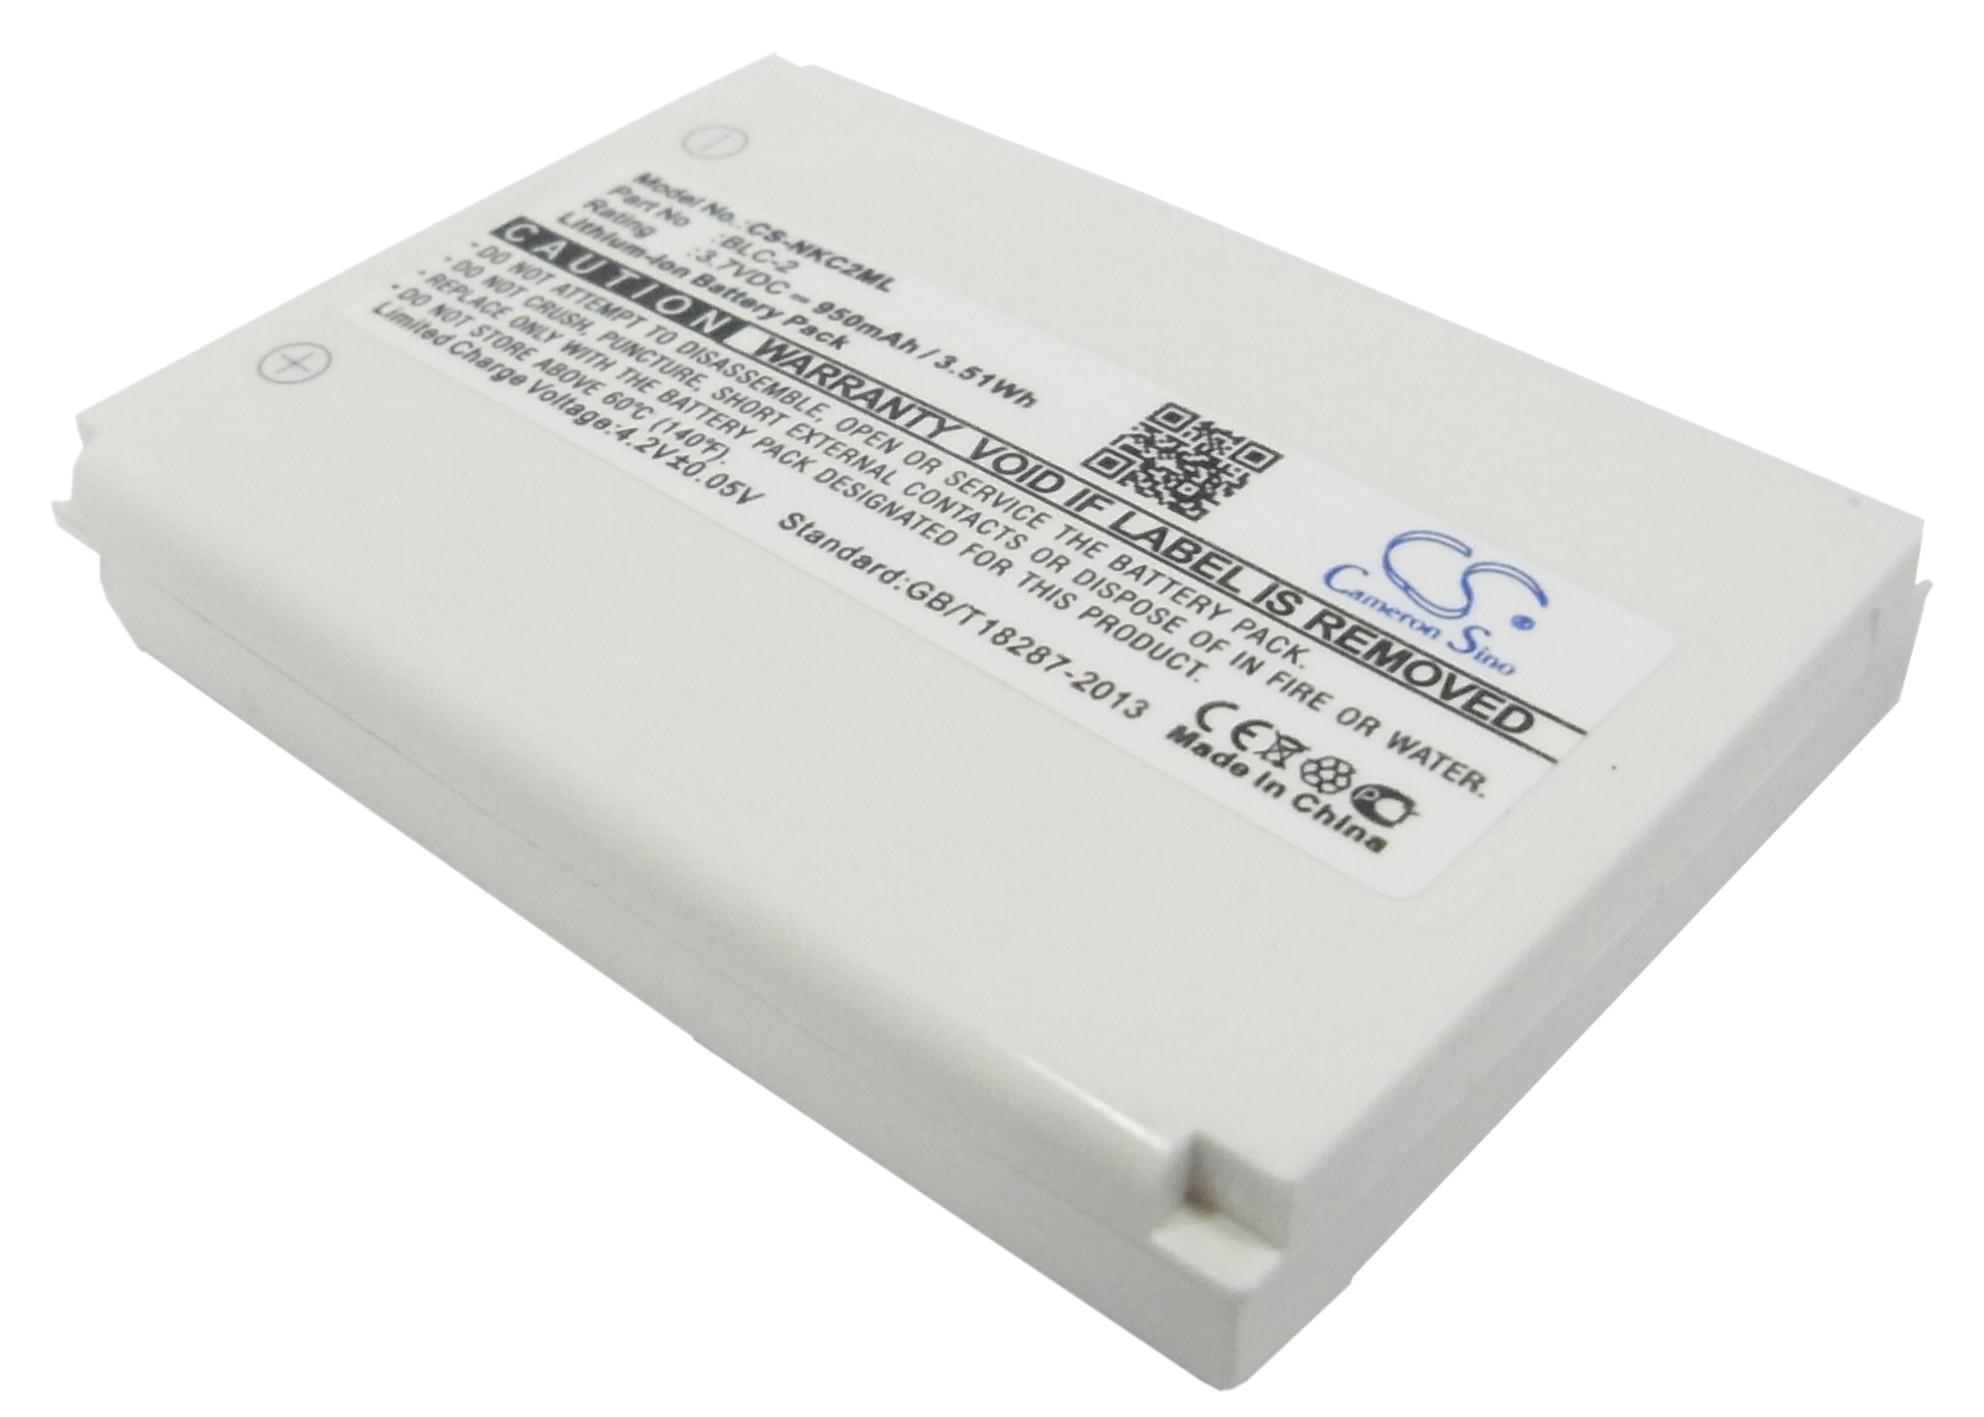 Батерия за телефон за NOKIA 1220, 3310, 3510, 6010 3.7V 950mAh CAMERON SINO